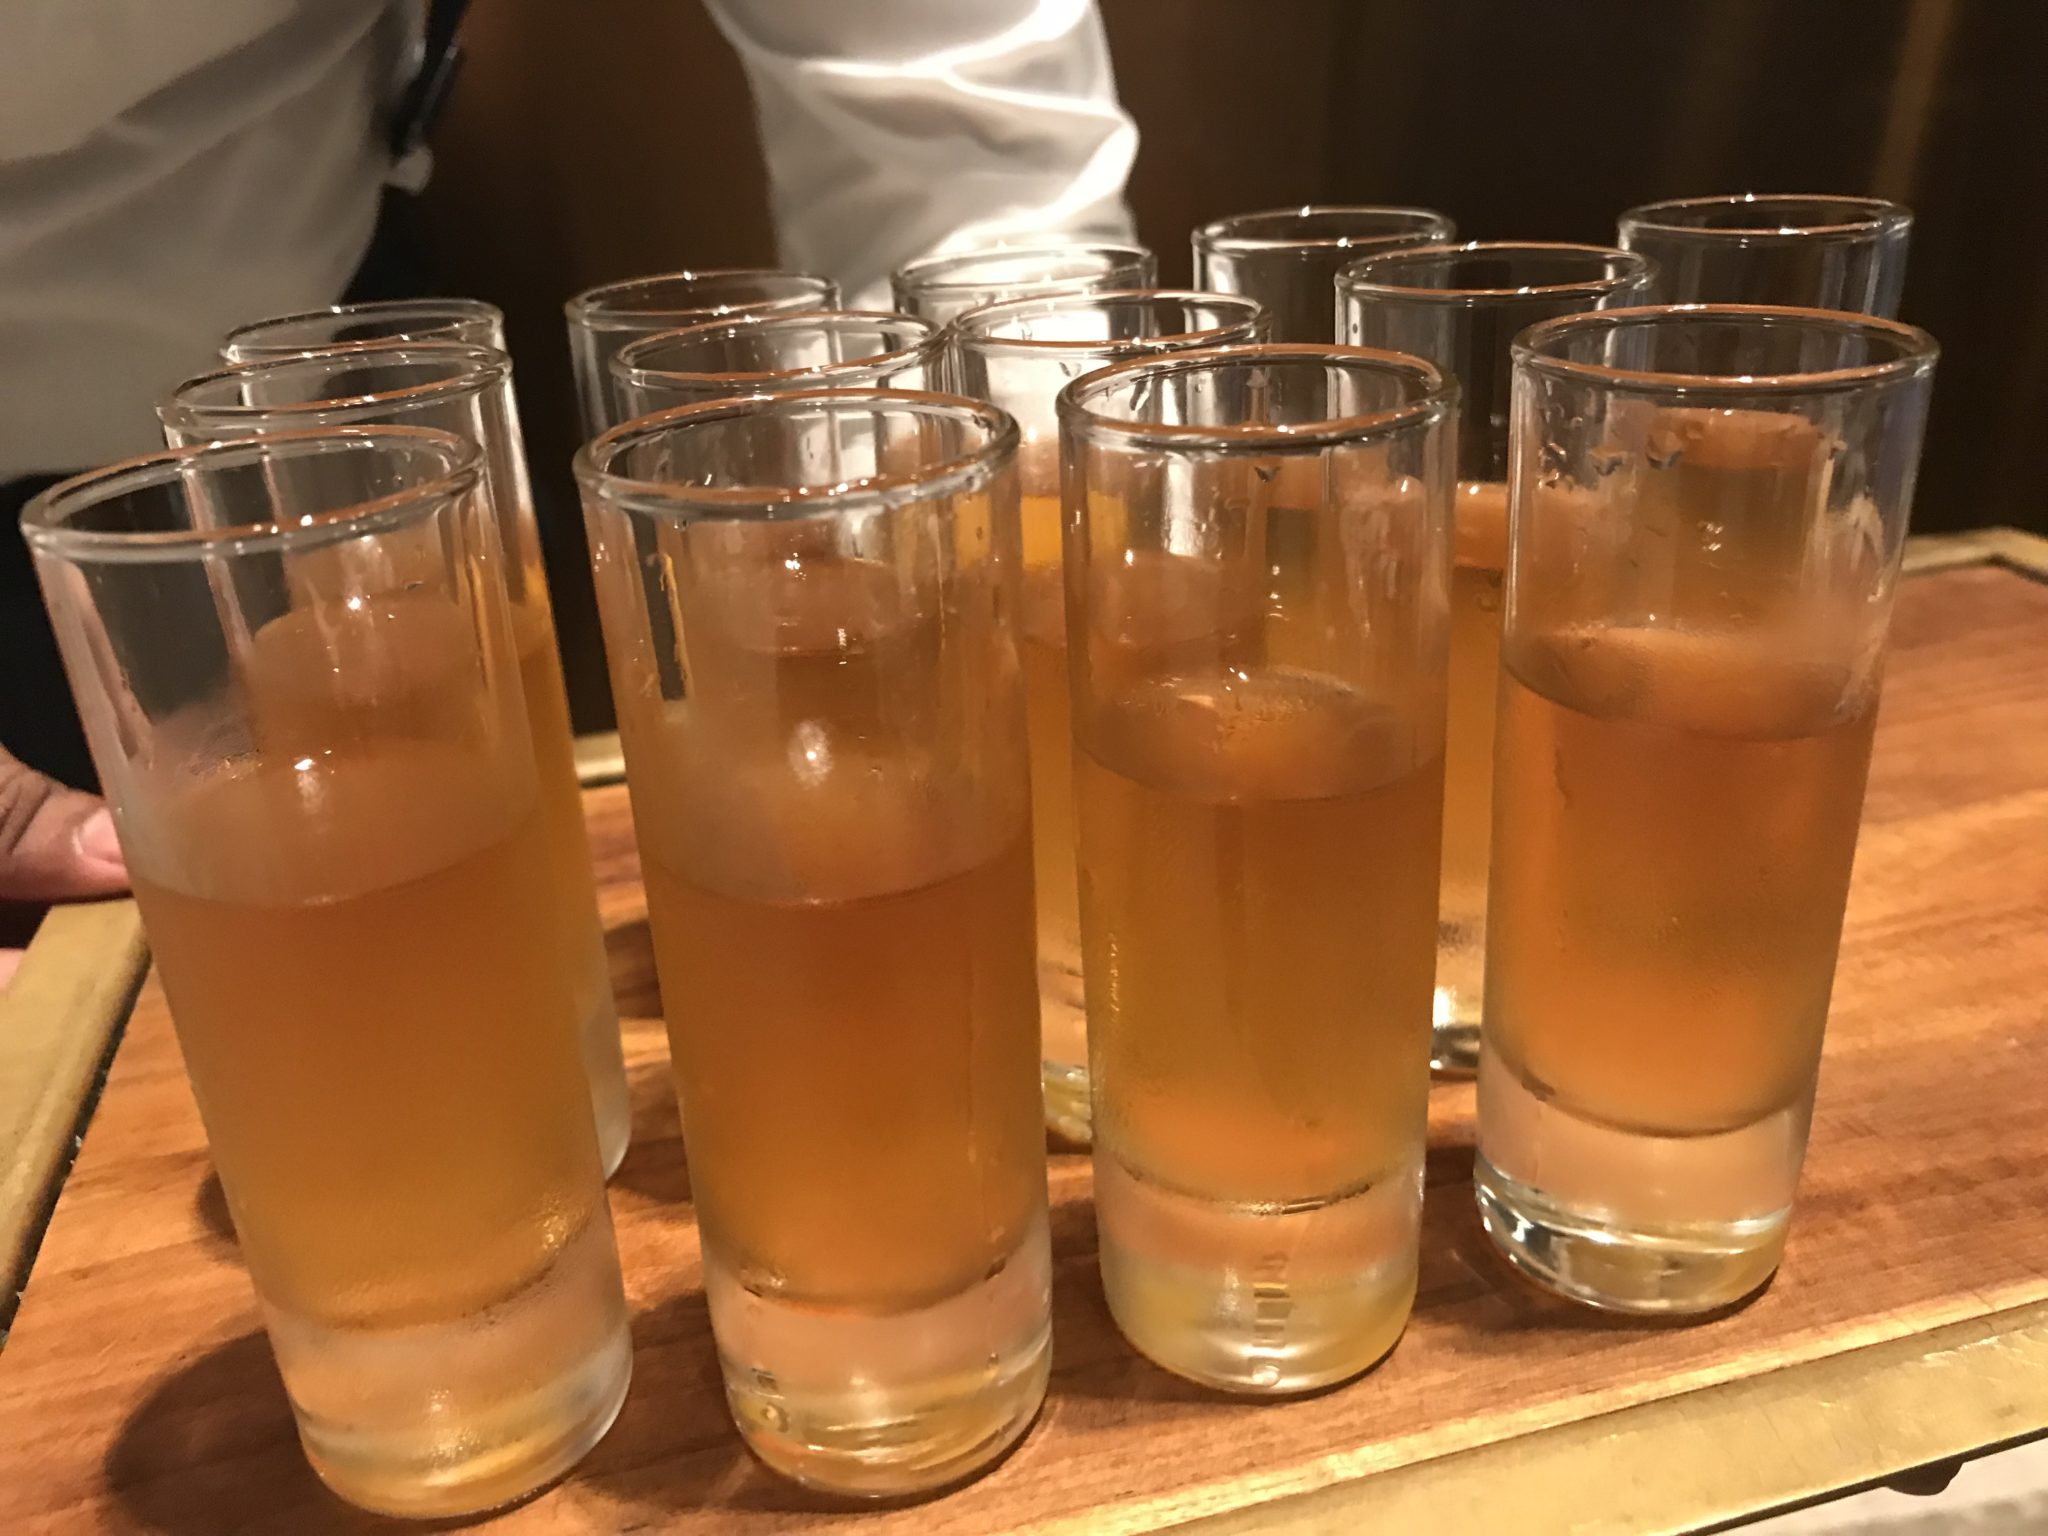 cognac-and-cointreau-shots